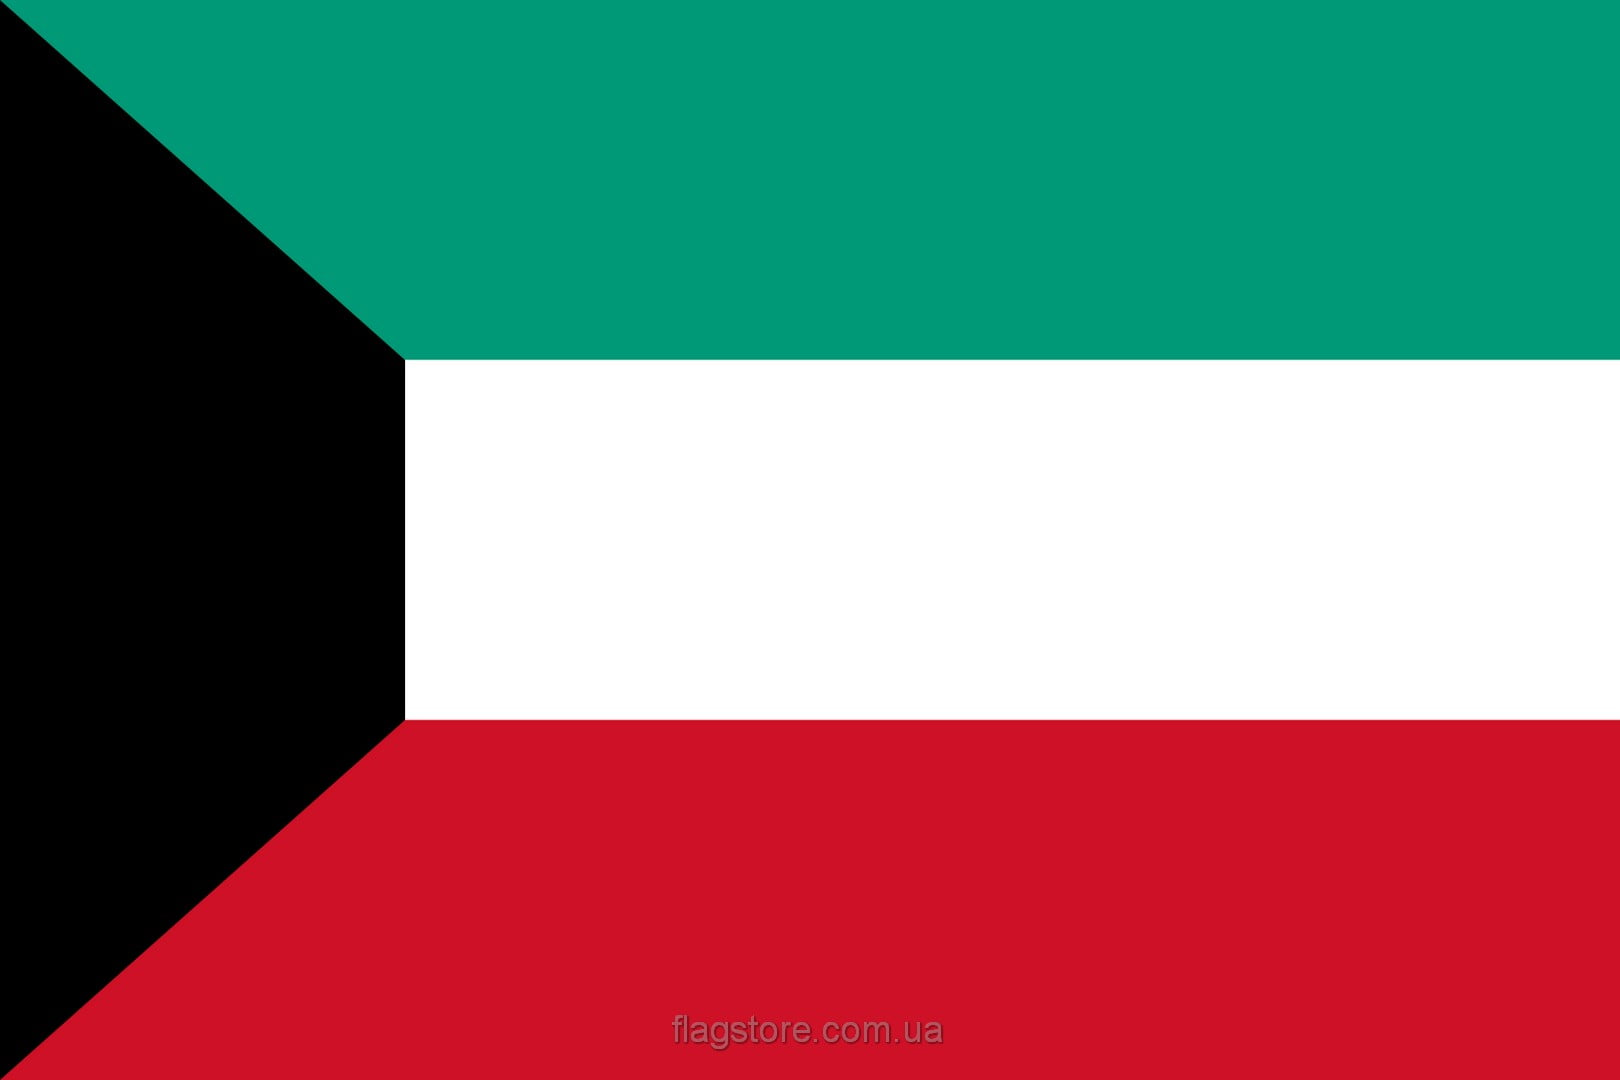 Купить флаг Кувейта (страны Кувейт)